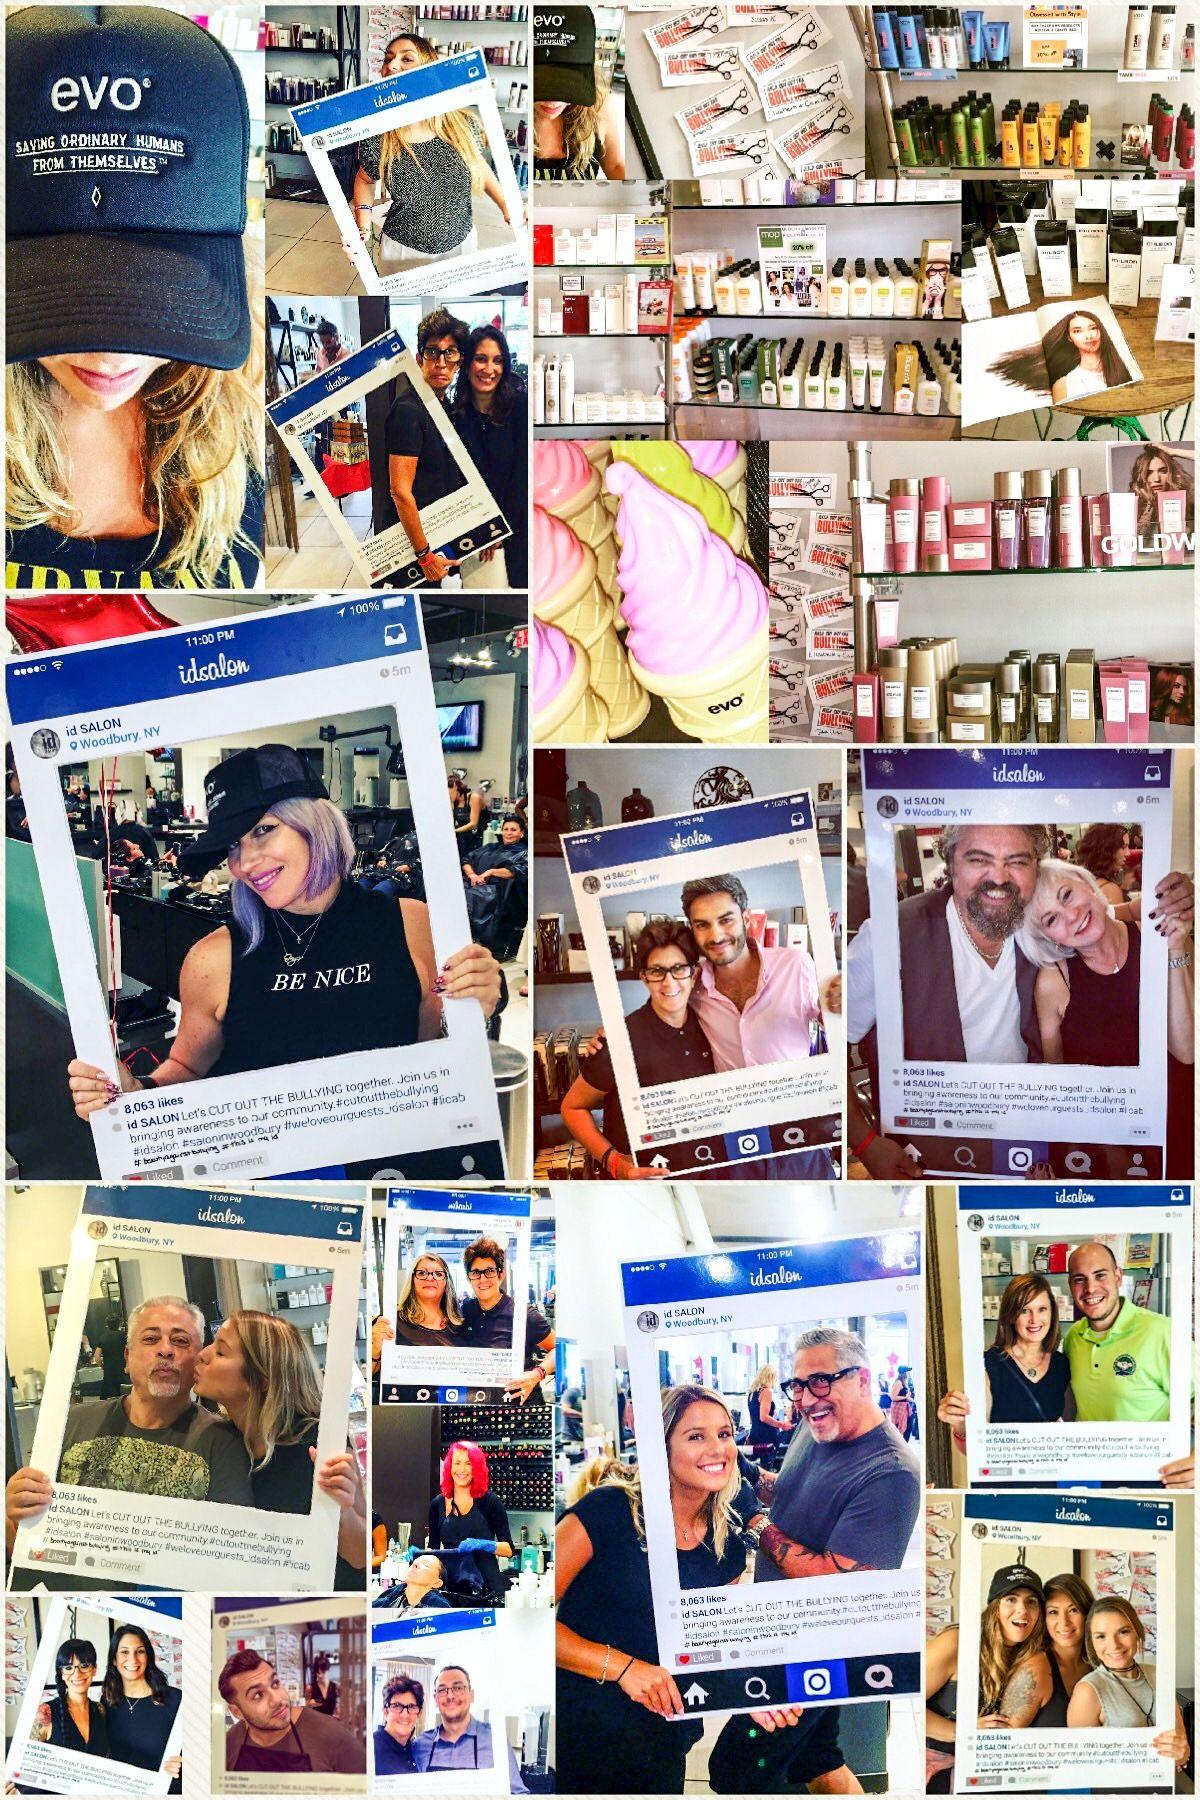 STAMP 2017: ID Salon's Philanthropic Campaign